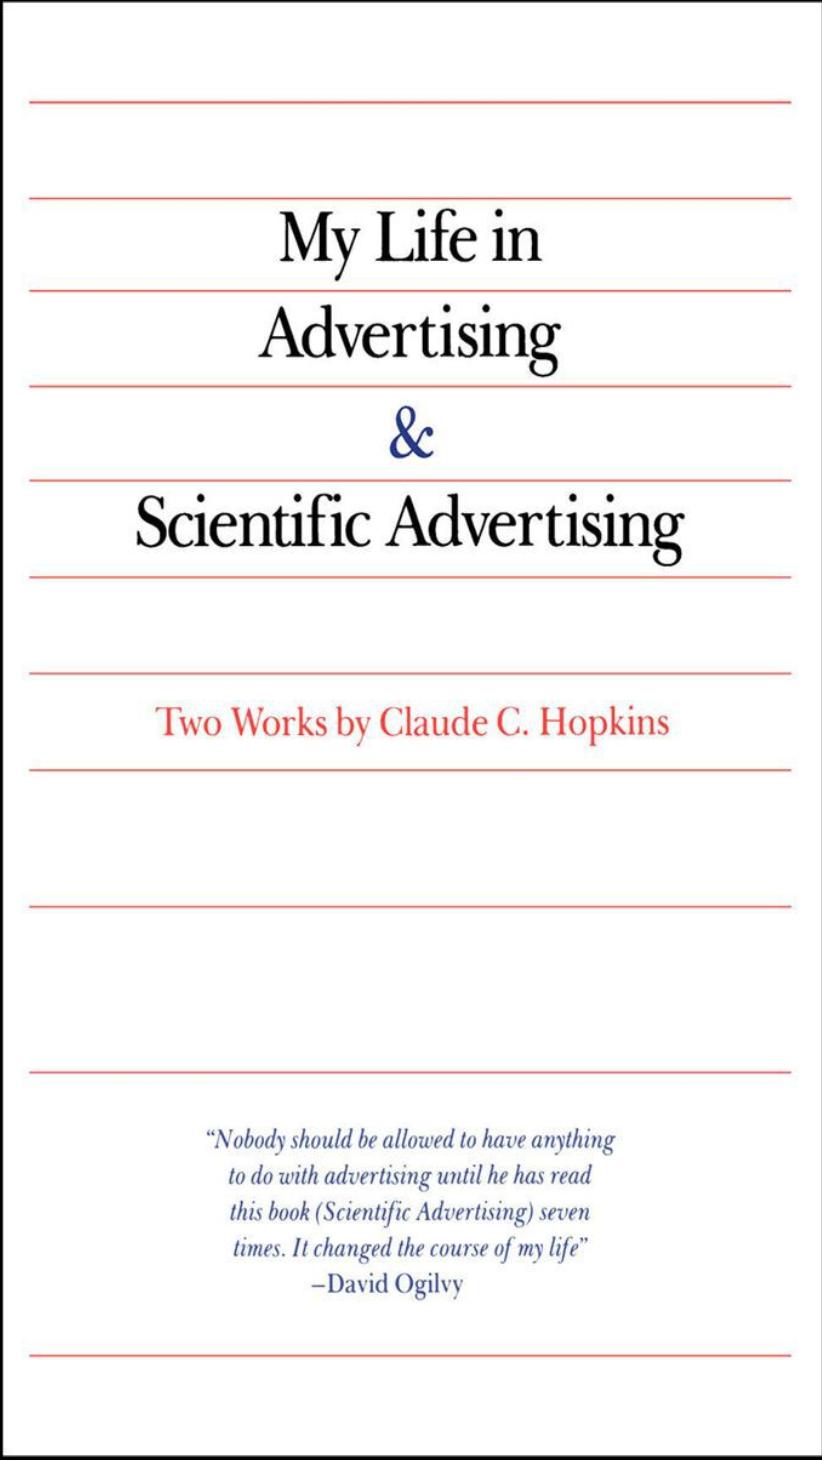 Buku My Life in Advertising & Scientific Advertising oleh Claude C. Hopkins